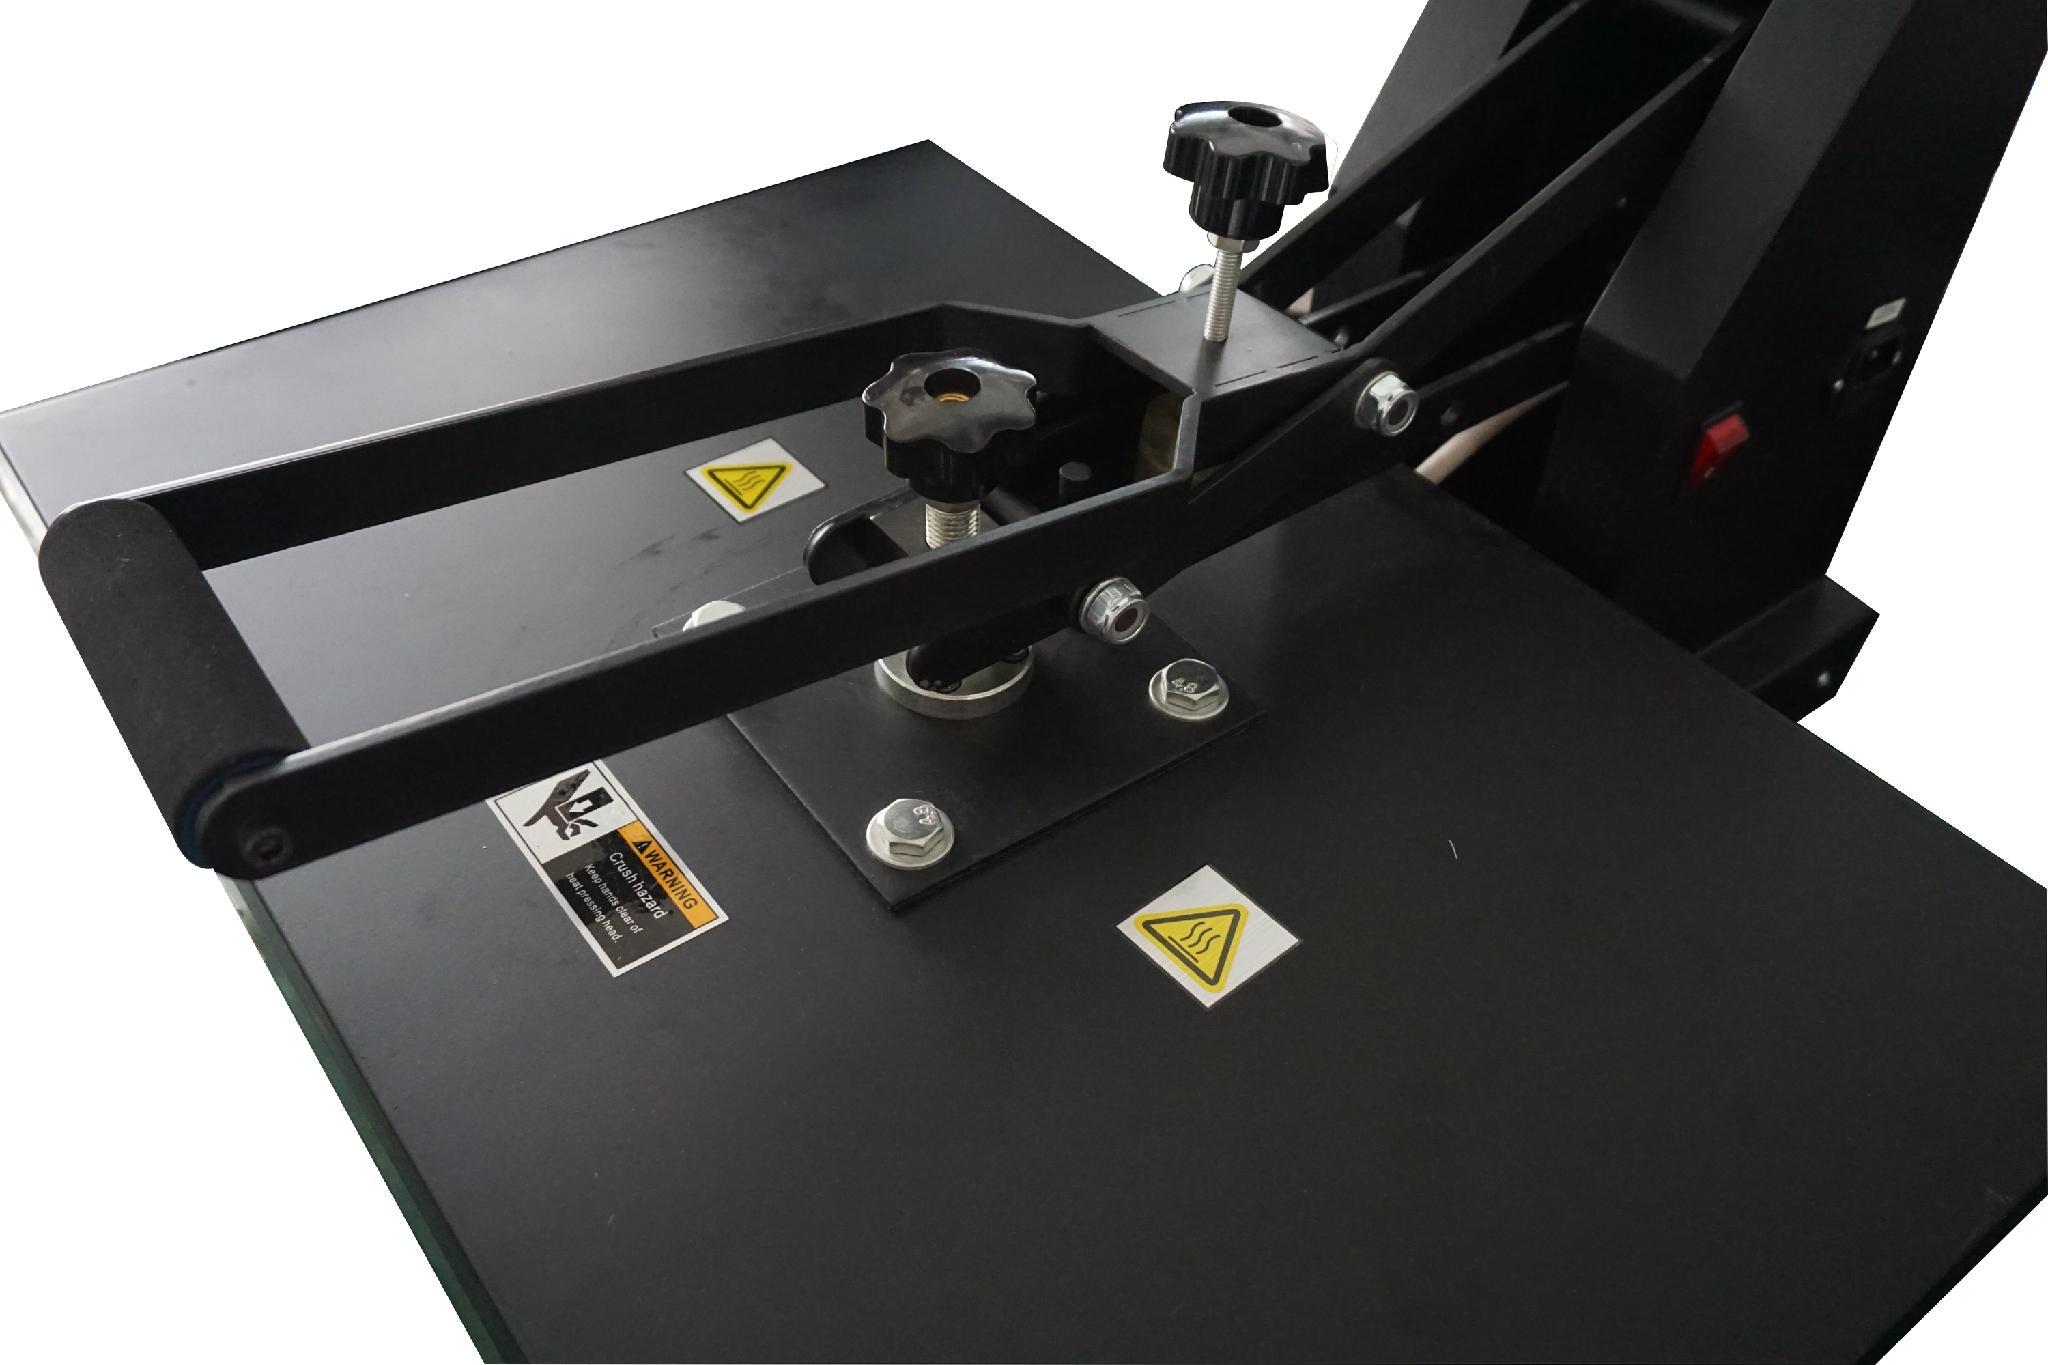 YXD-G5(B) 29*38cm high pressure t shirt printing machine 13